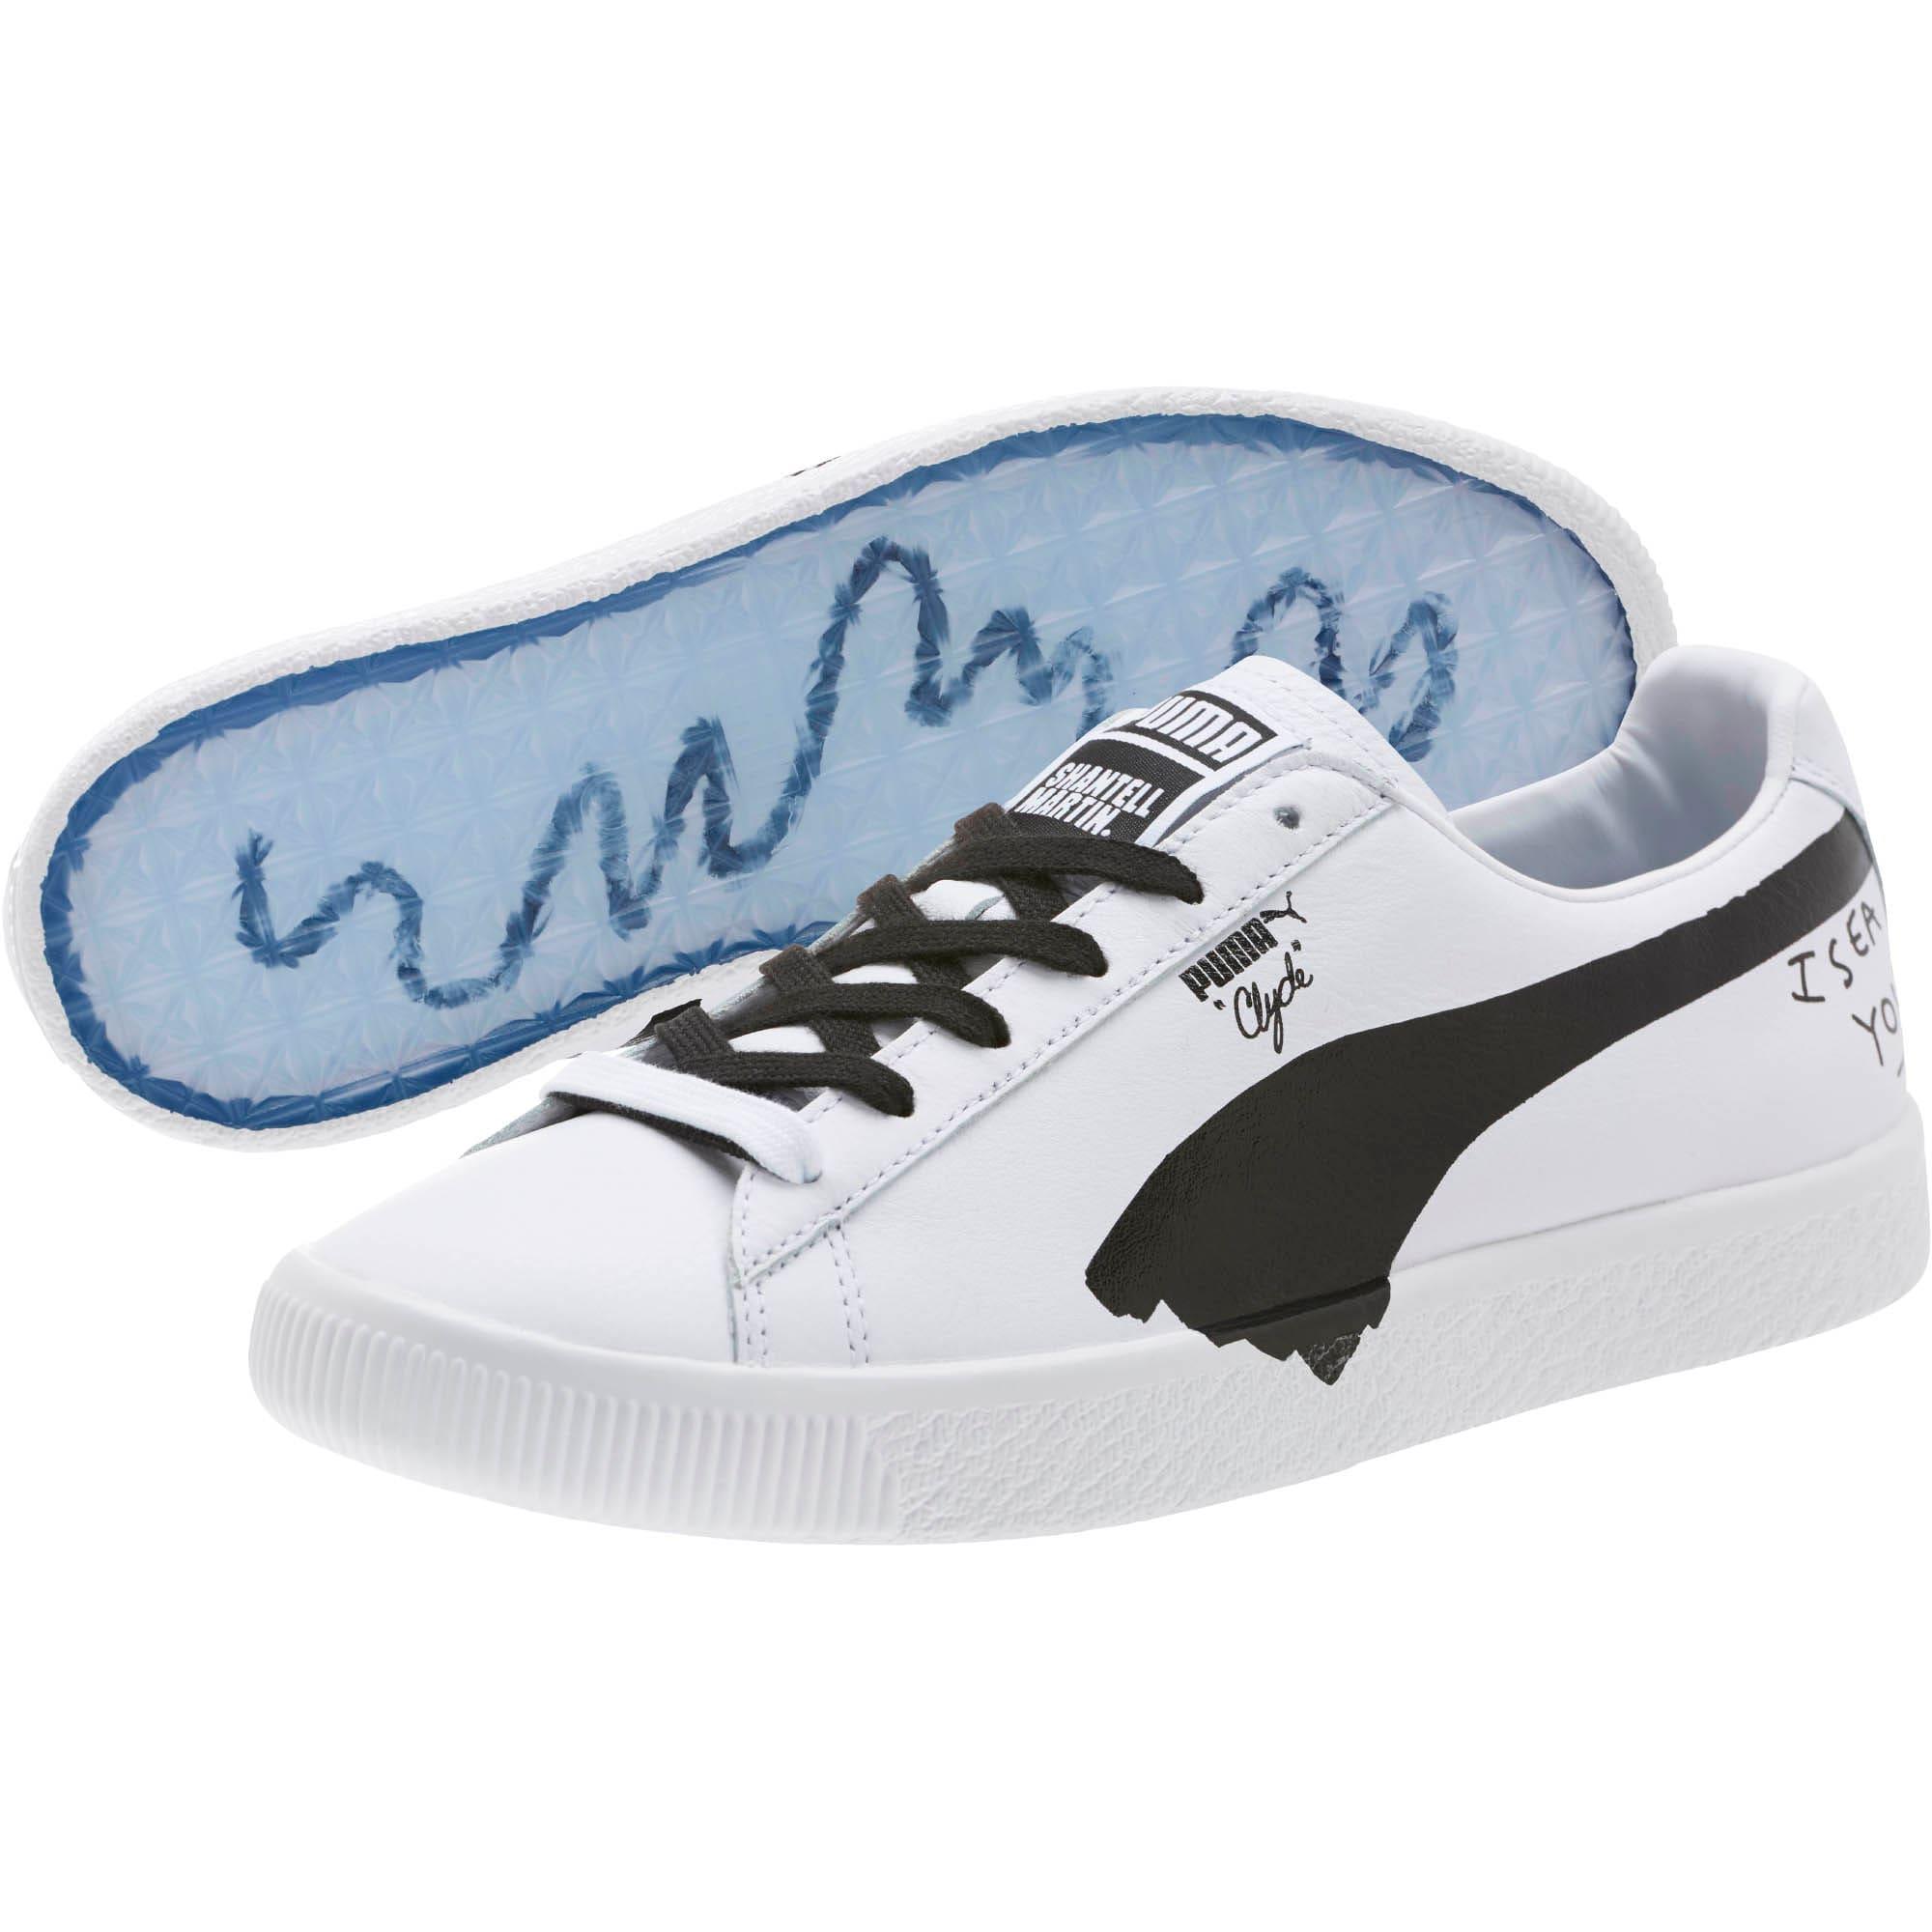 Thumbnail 2 of PUMA x SHANTELL MARTIN Clyde Sneakers, Puma White-Puma Black, medium